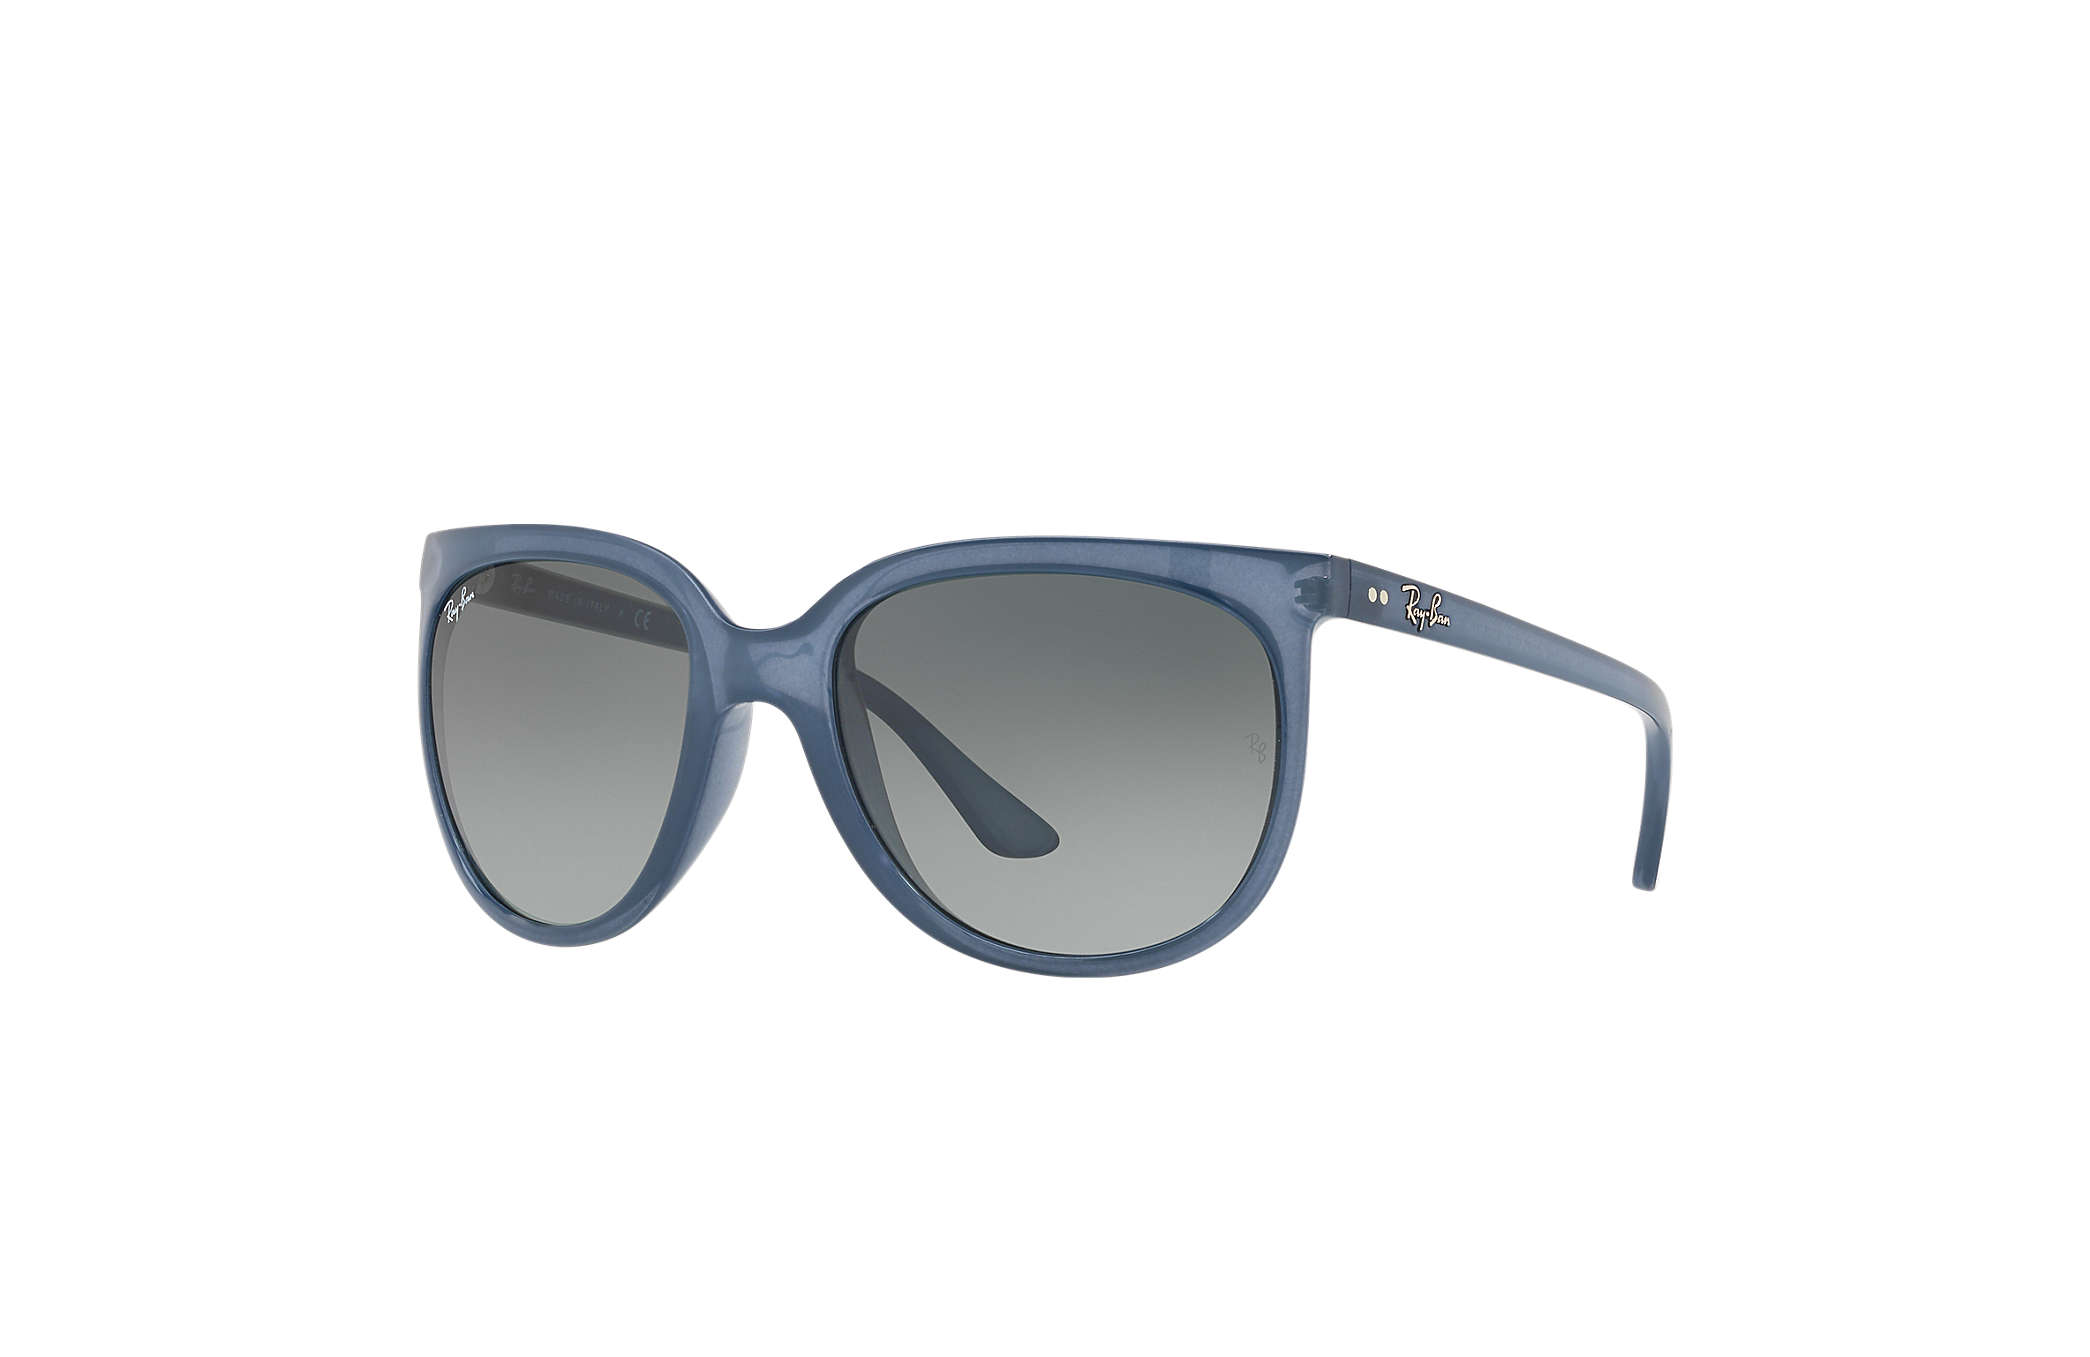 Ray-Ban Cats 1000 Blue, RB4126 | Ray-Ban® USA